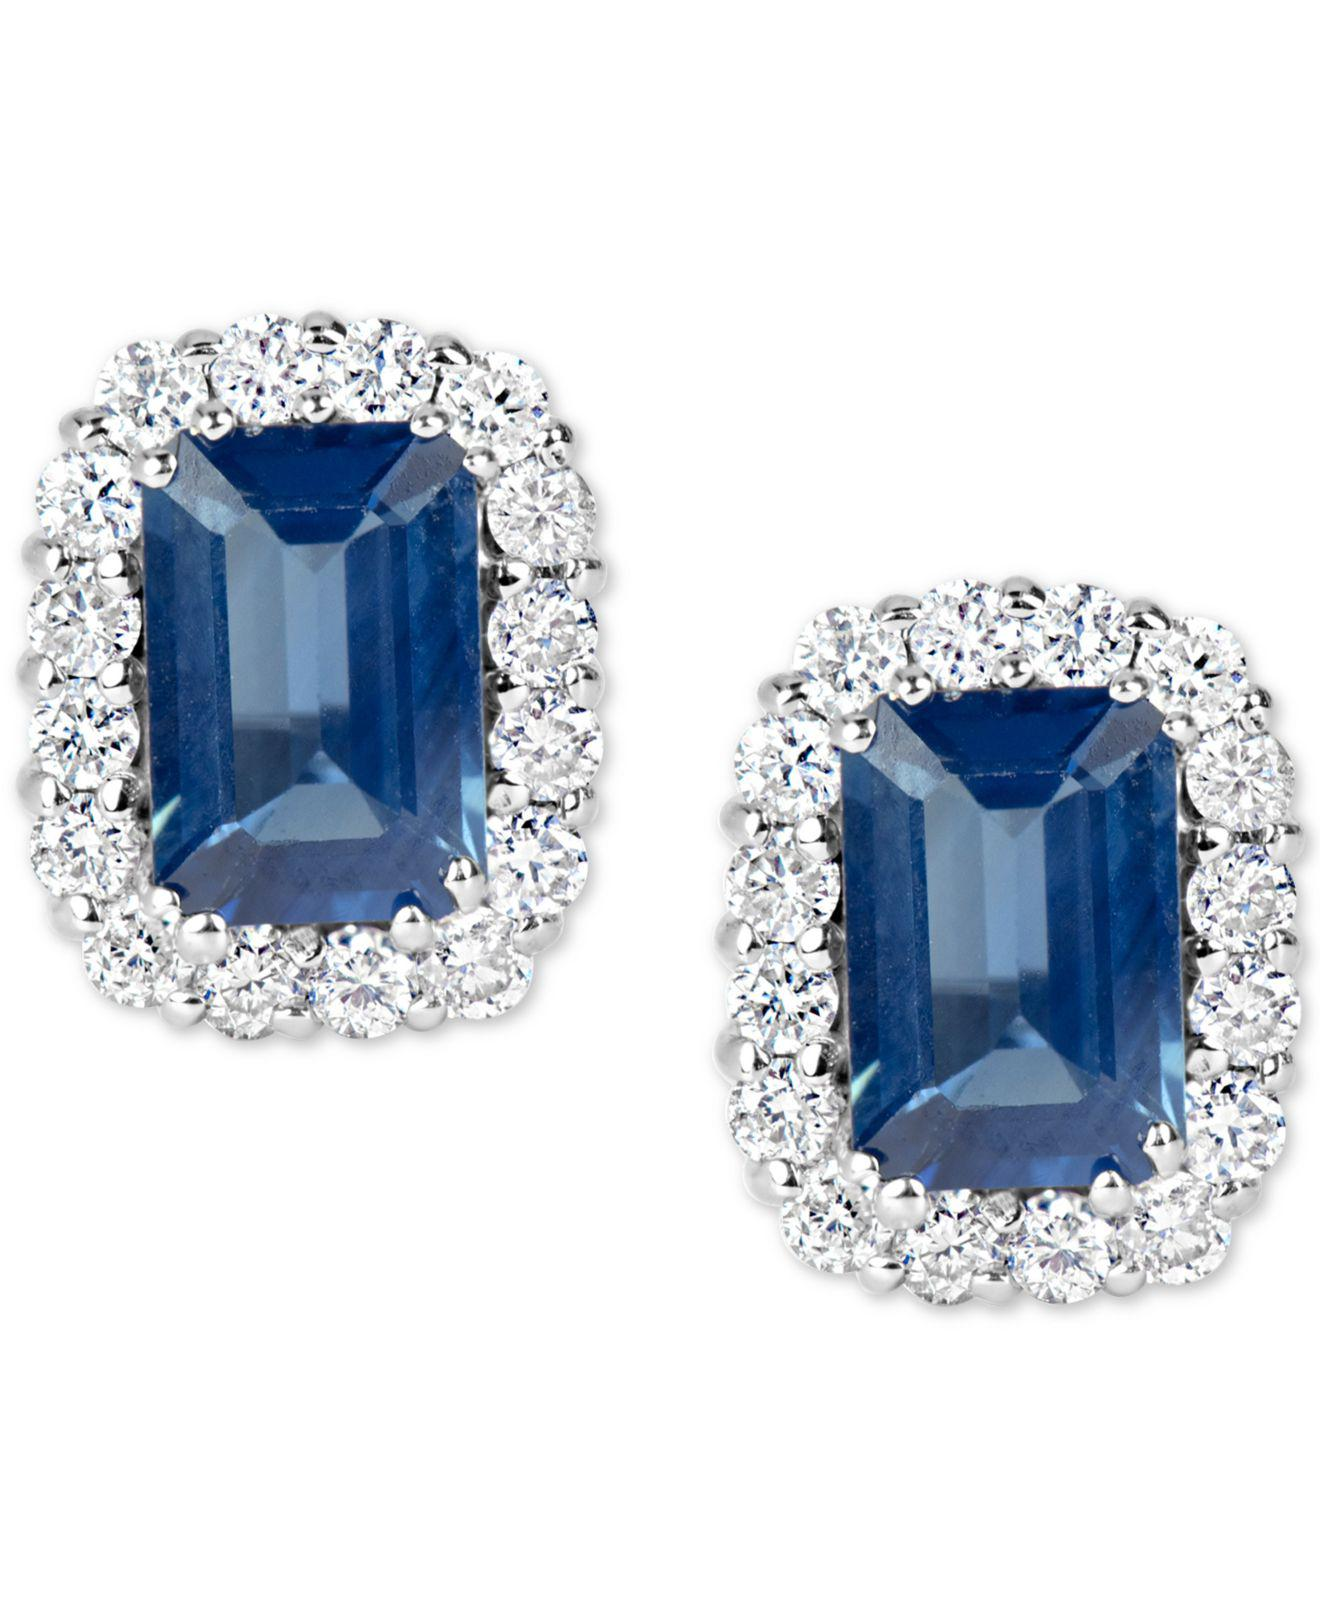 f4da871af Lyst - Macy's Sapphire (1-3/8 Ct. T.w.) And Diamond (1/3 Ct. T.w. ...